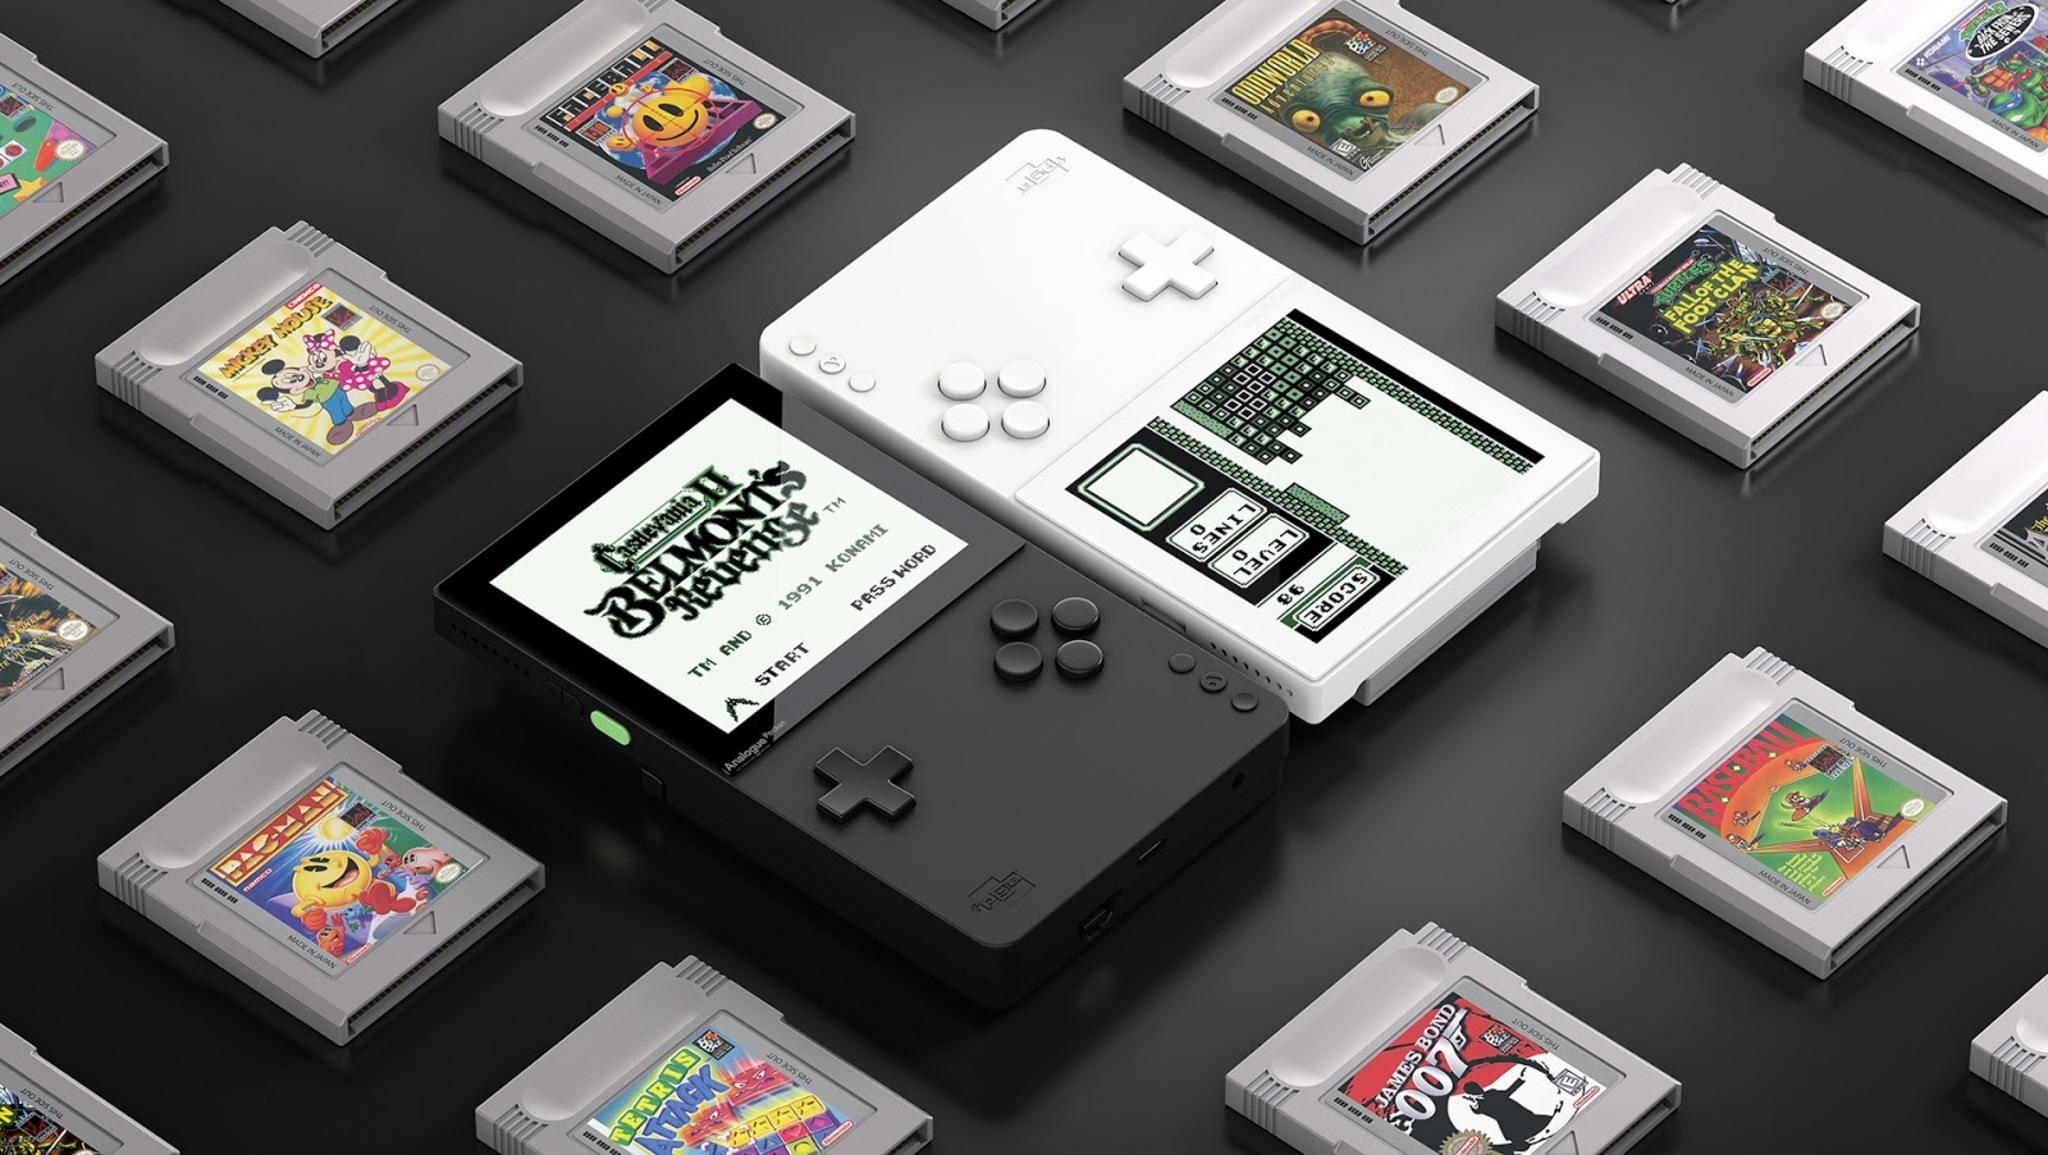 analogue-pocket-handheld